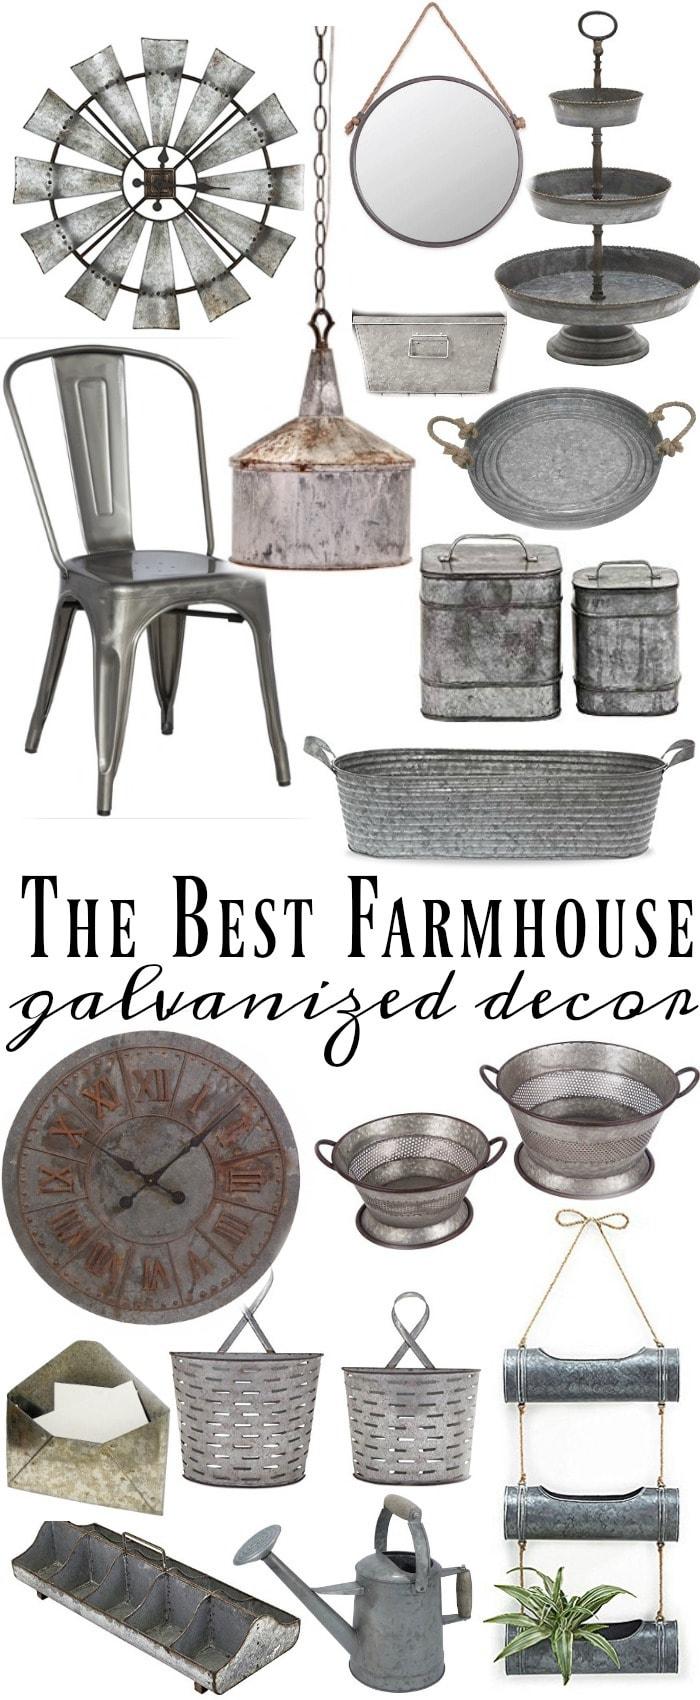 Where To Find The Best Galvanized Home Decor Liz Marie Blog